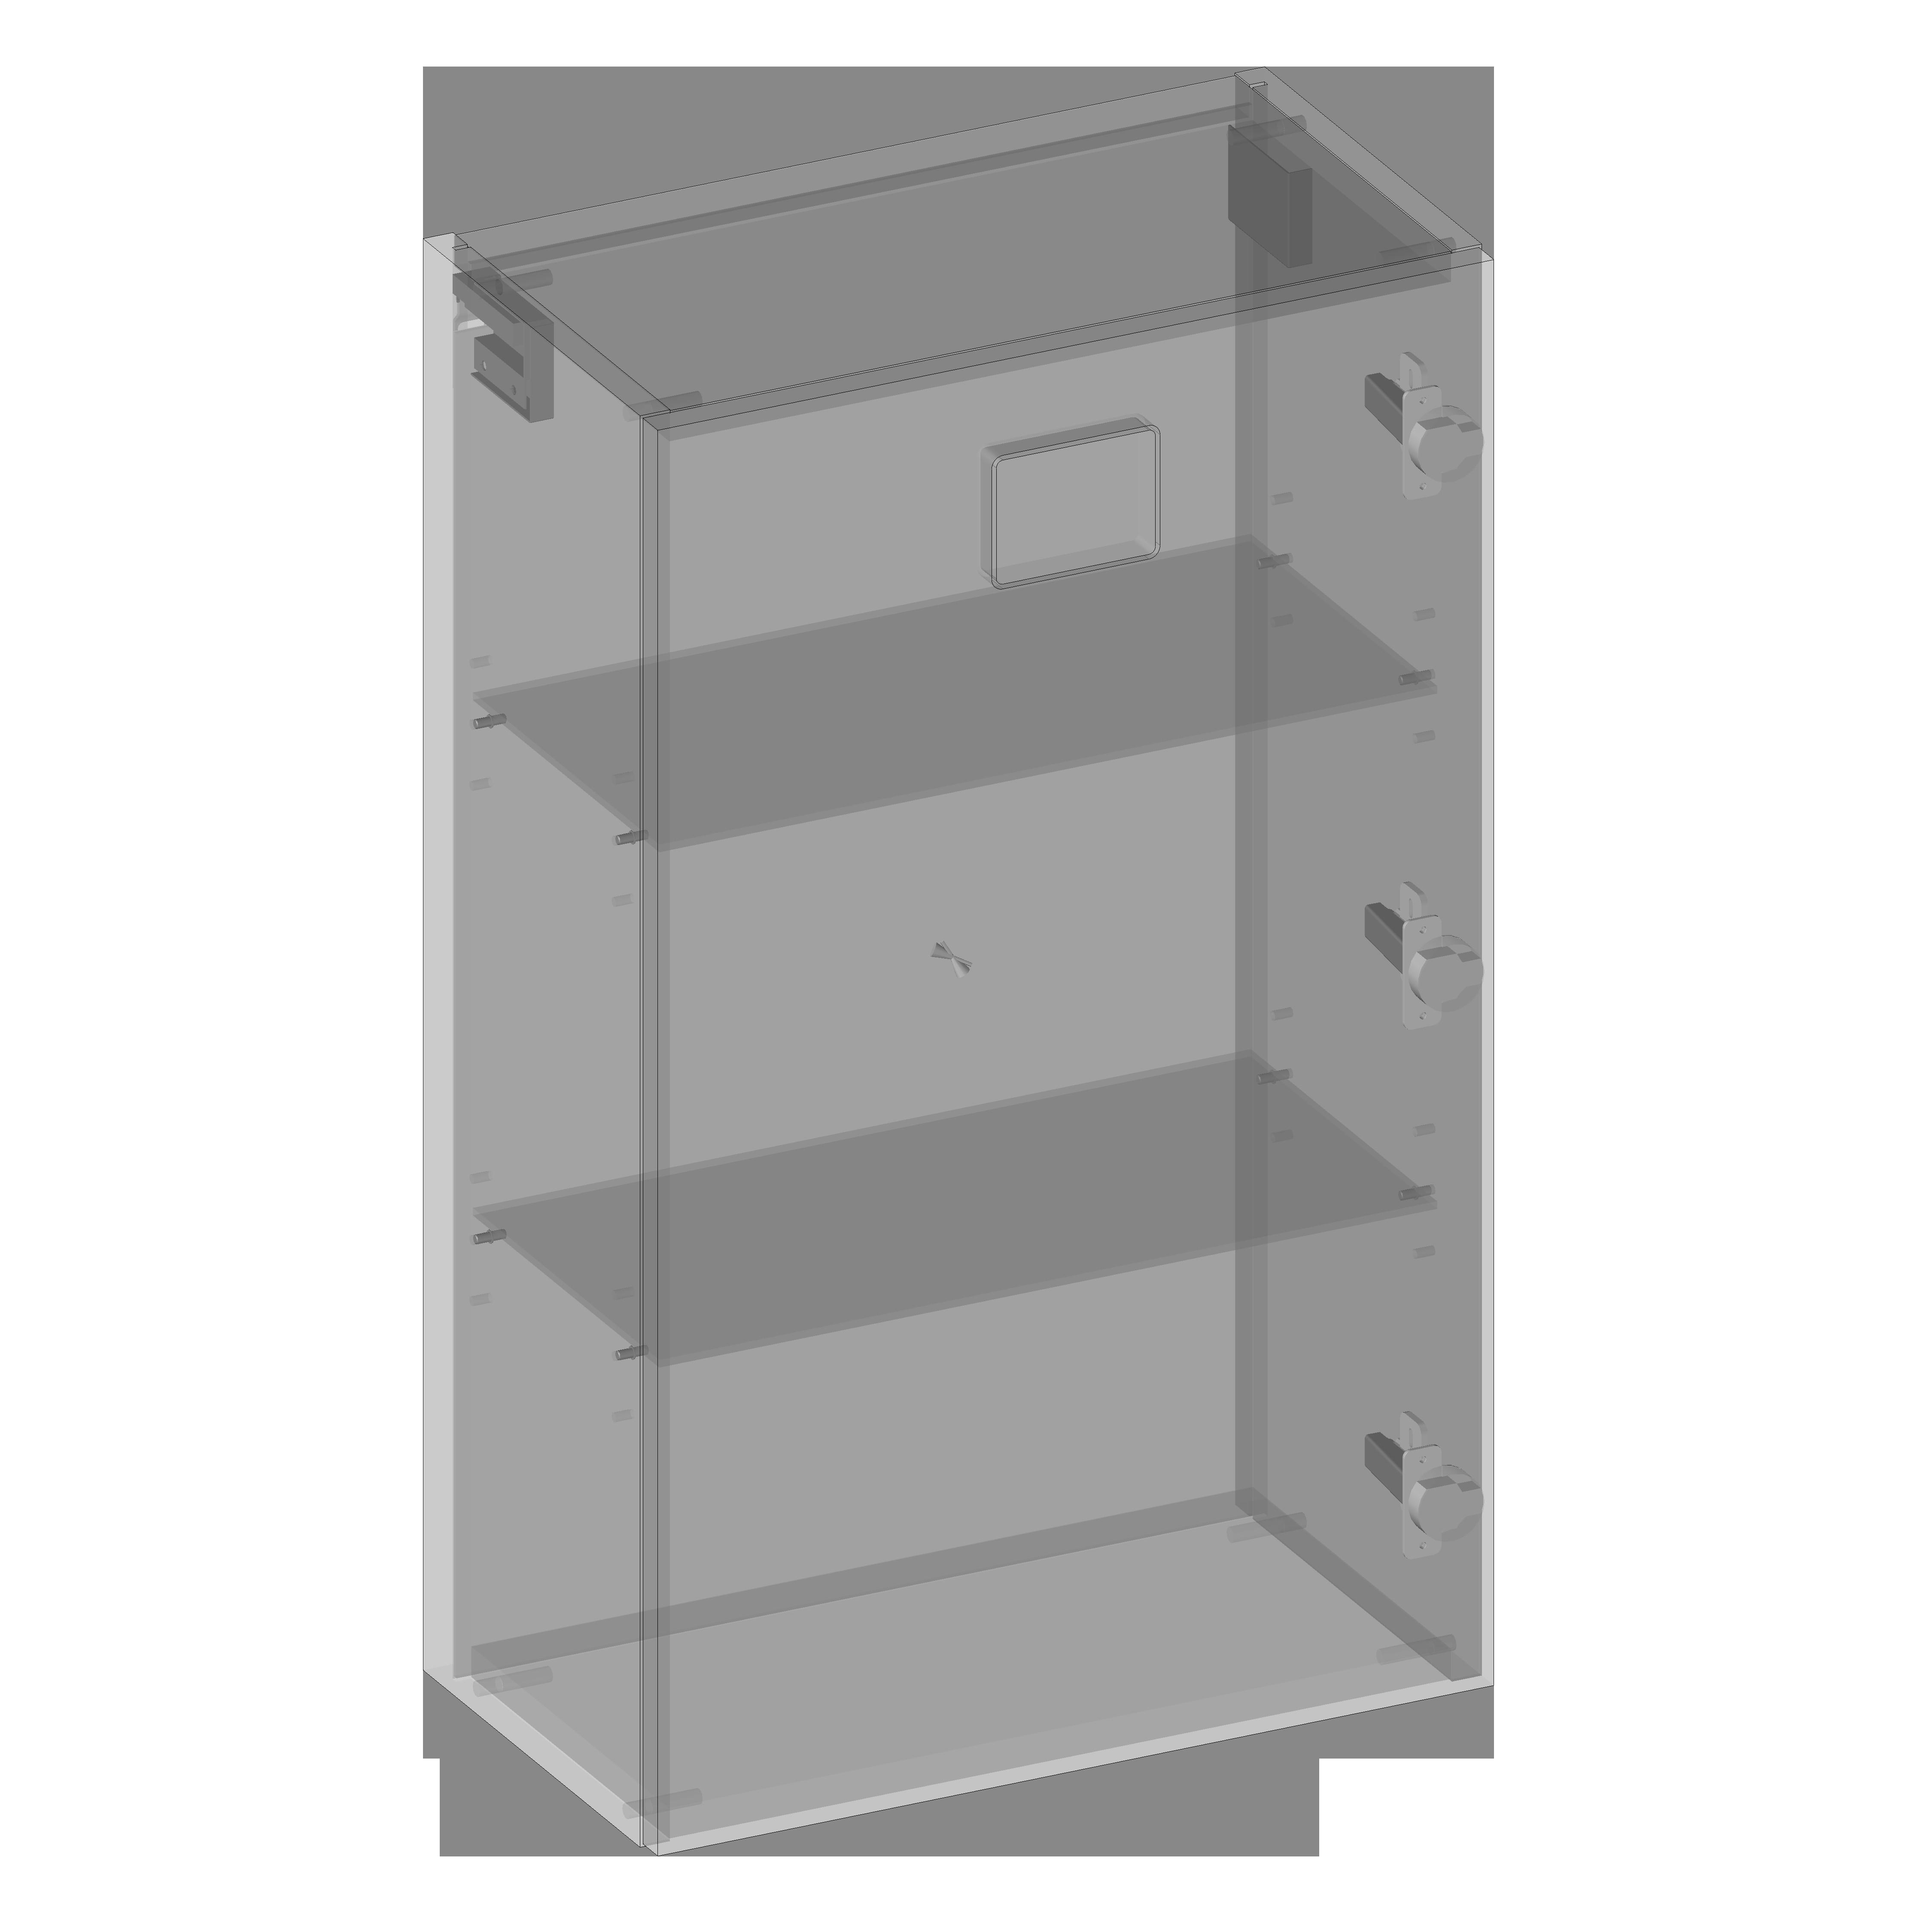 Hanging pillar lower one door, glass shelves